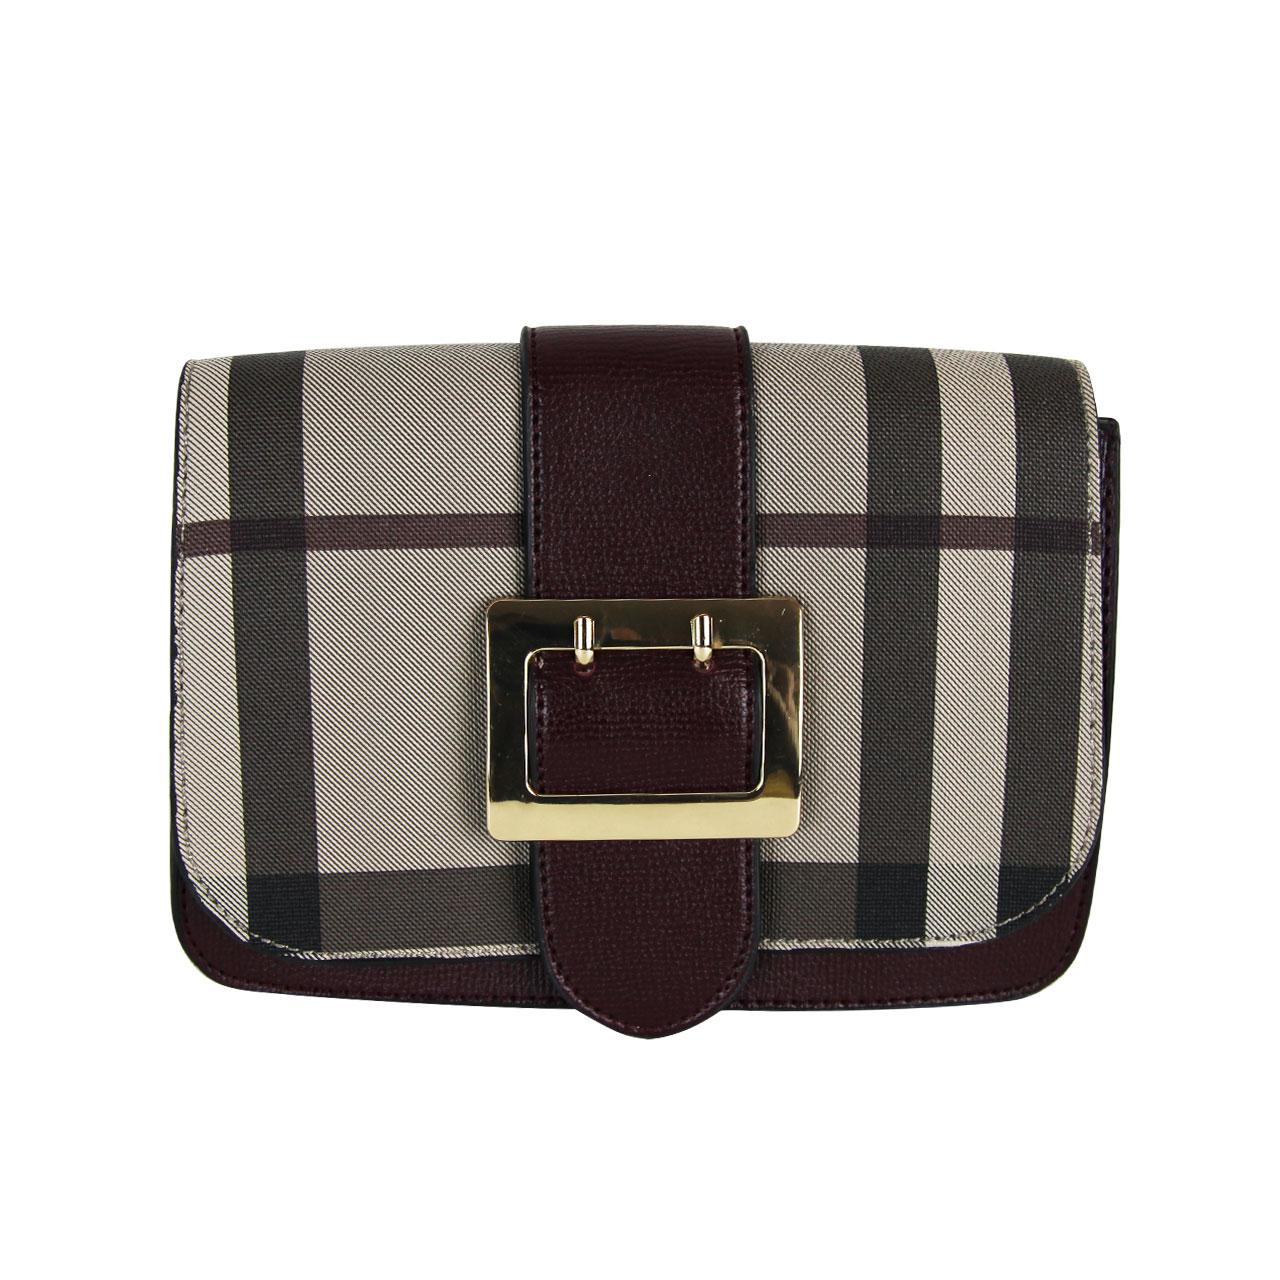 3 in 1 Brown Tote / Cross Body Bag / Shoulder Bag For Women